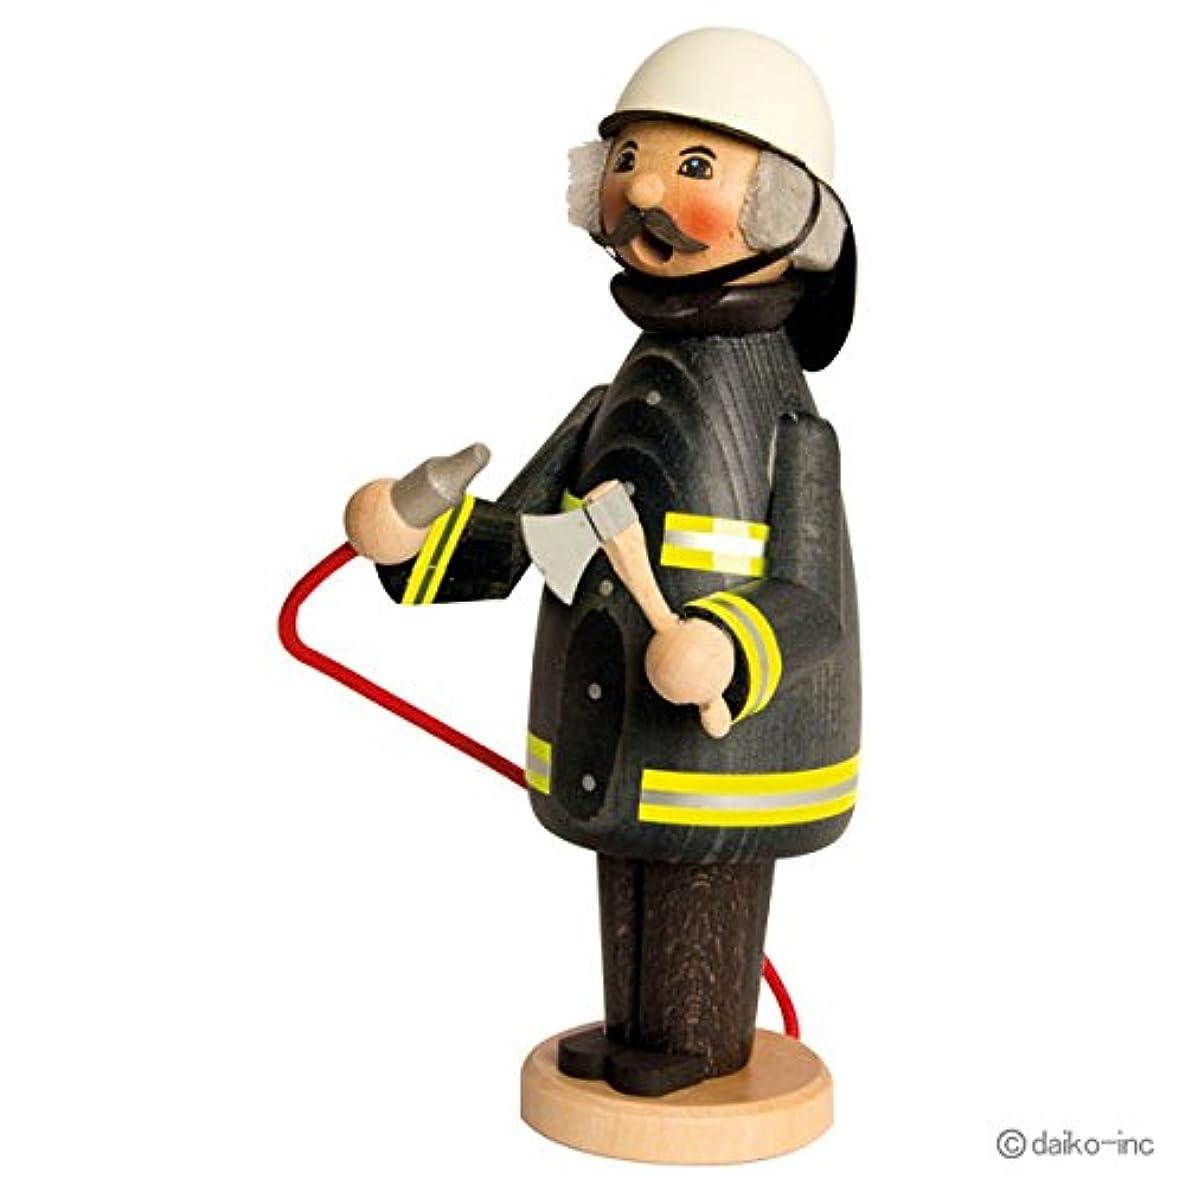 kuhnert ミニパイプ人形香炉 消防士